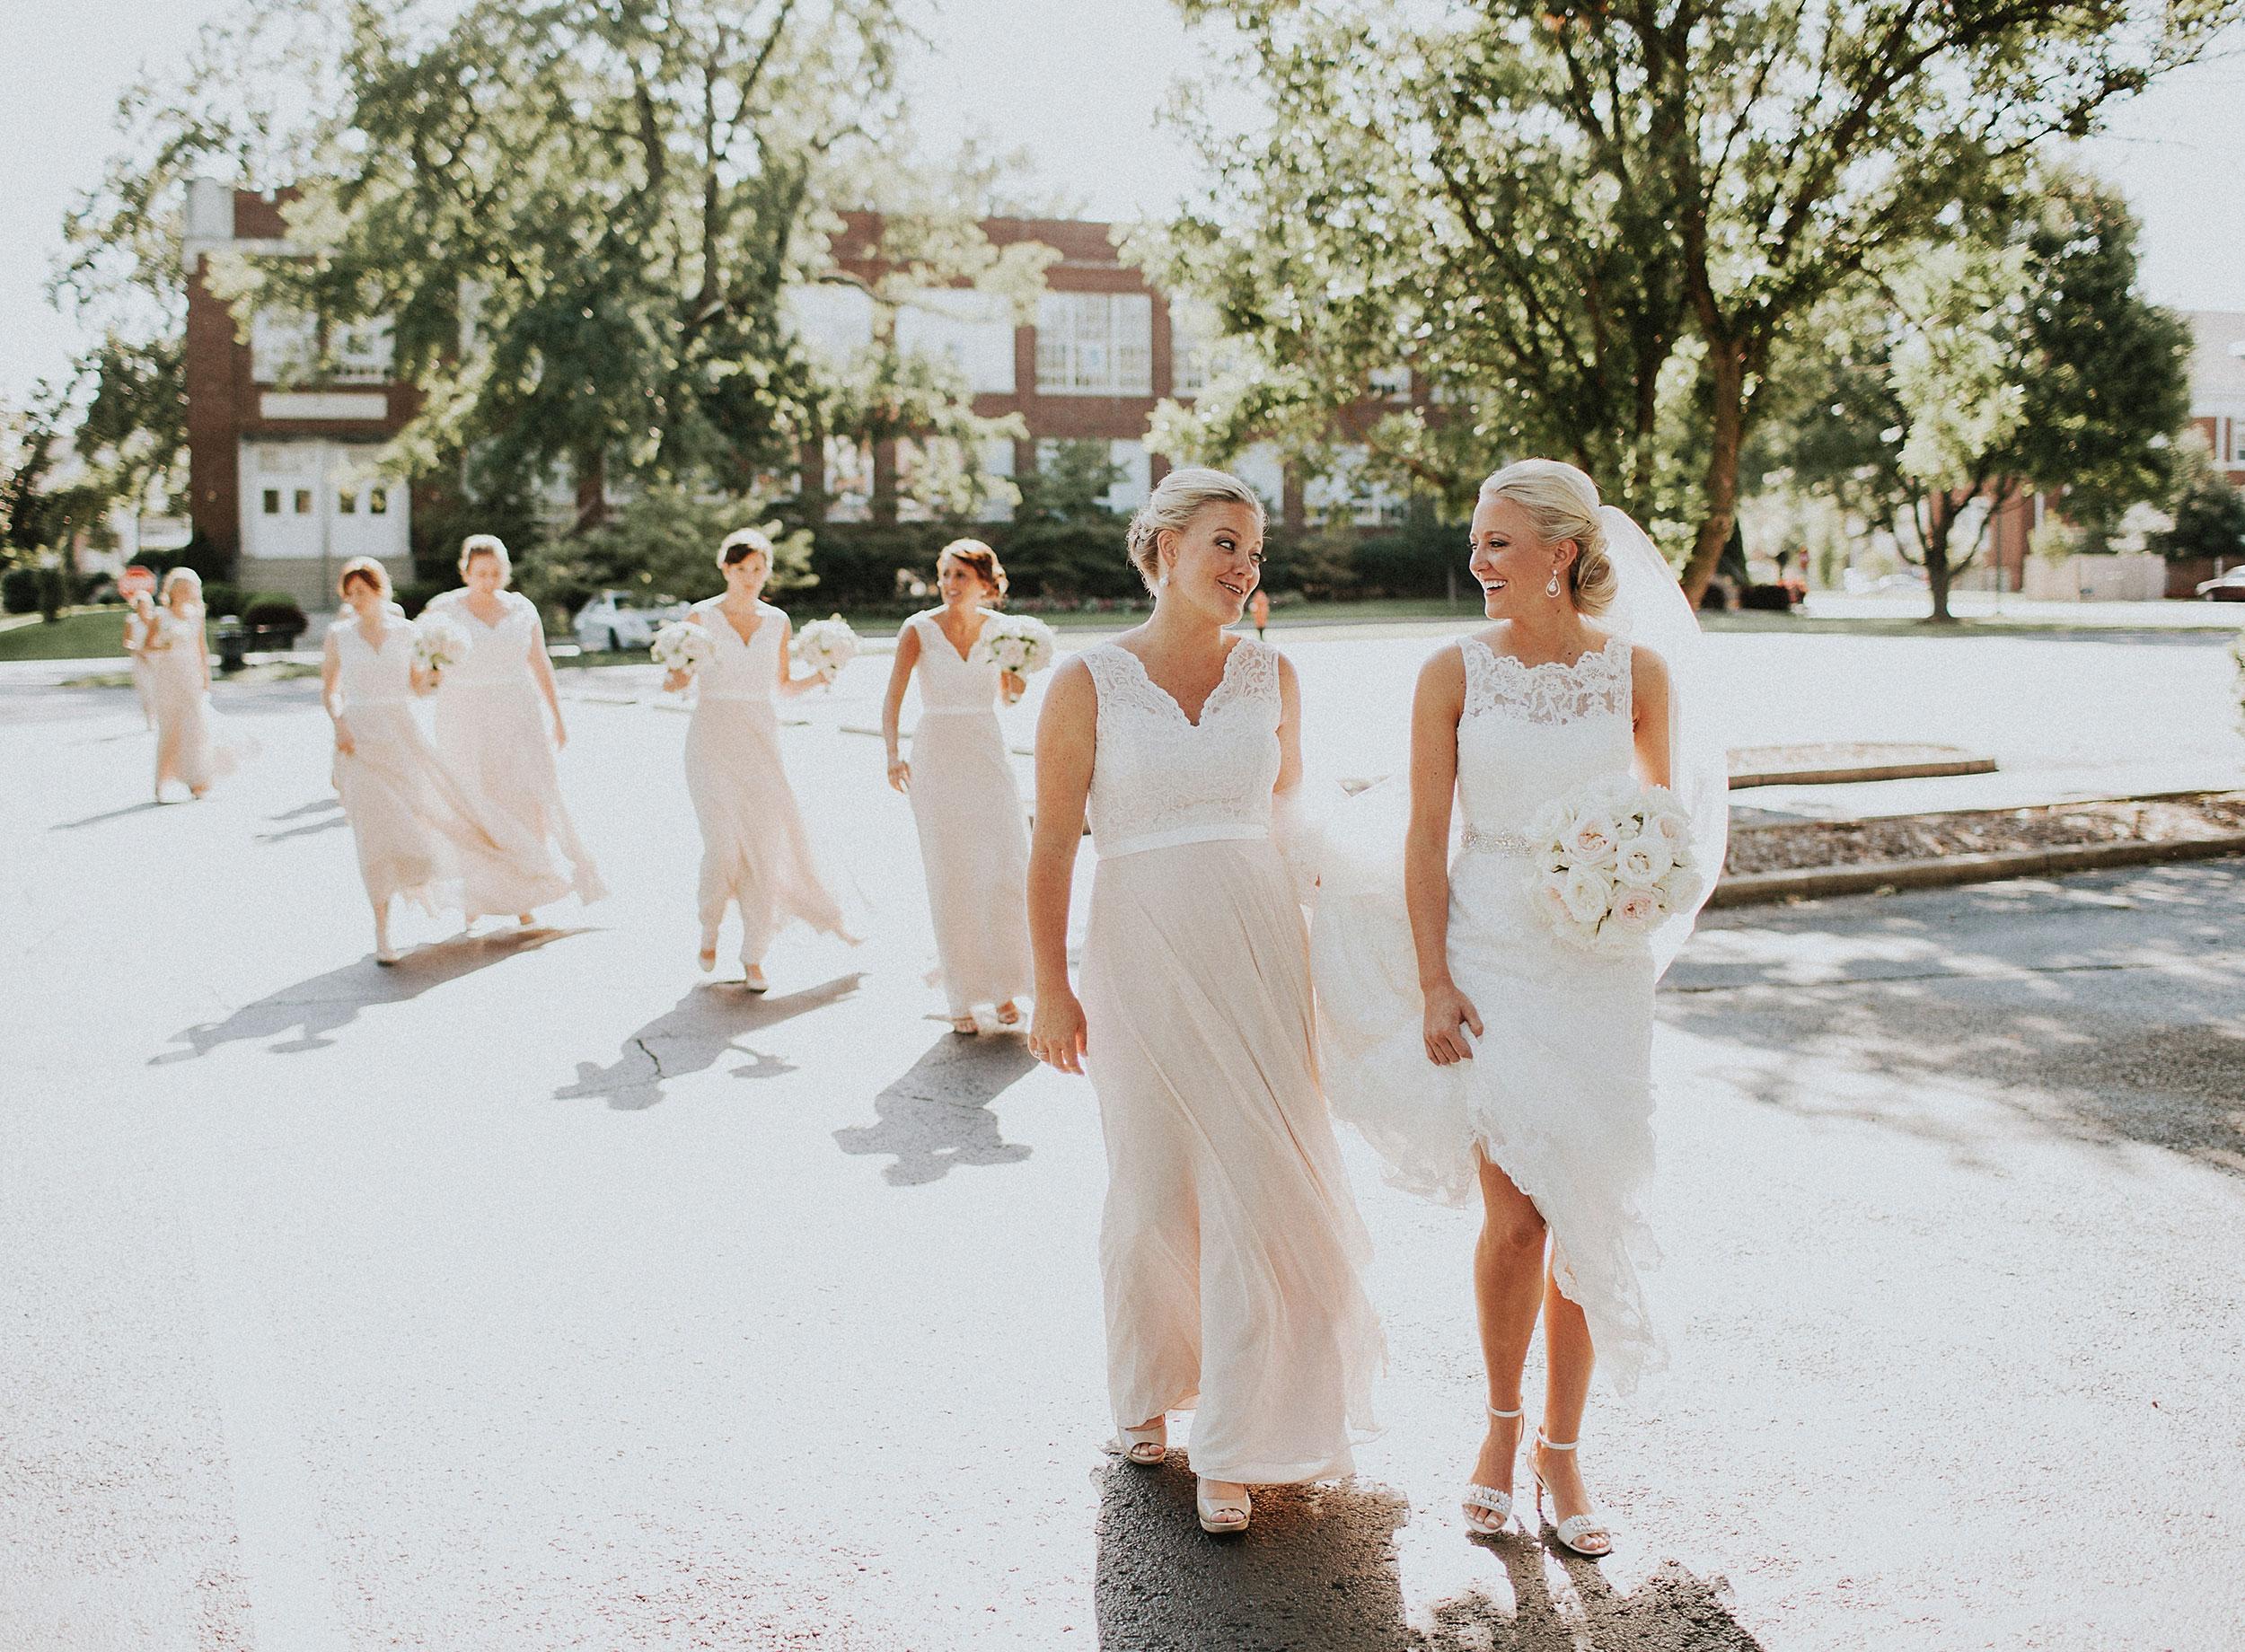 olmsted-wedding-louisville-kentucky-017.JPG